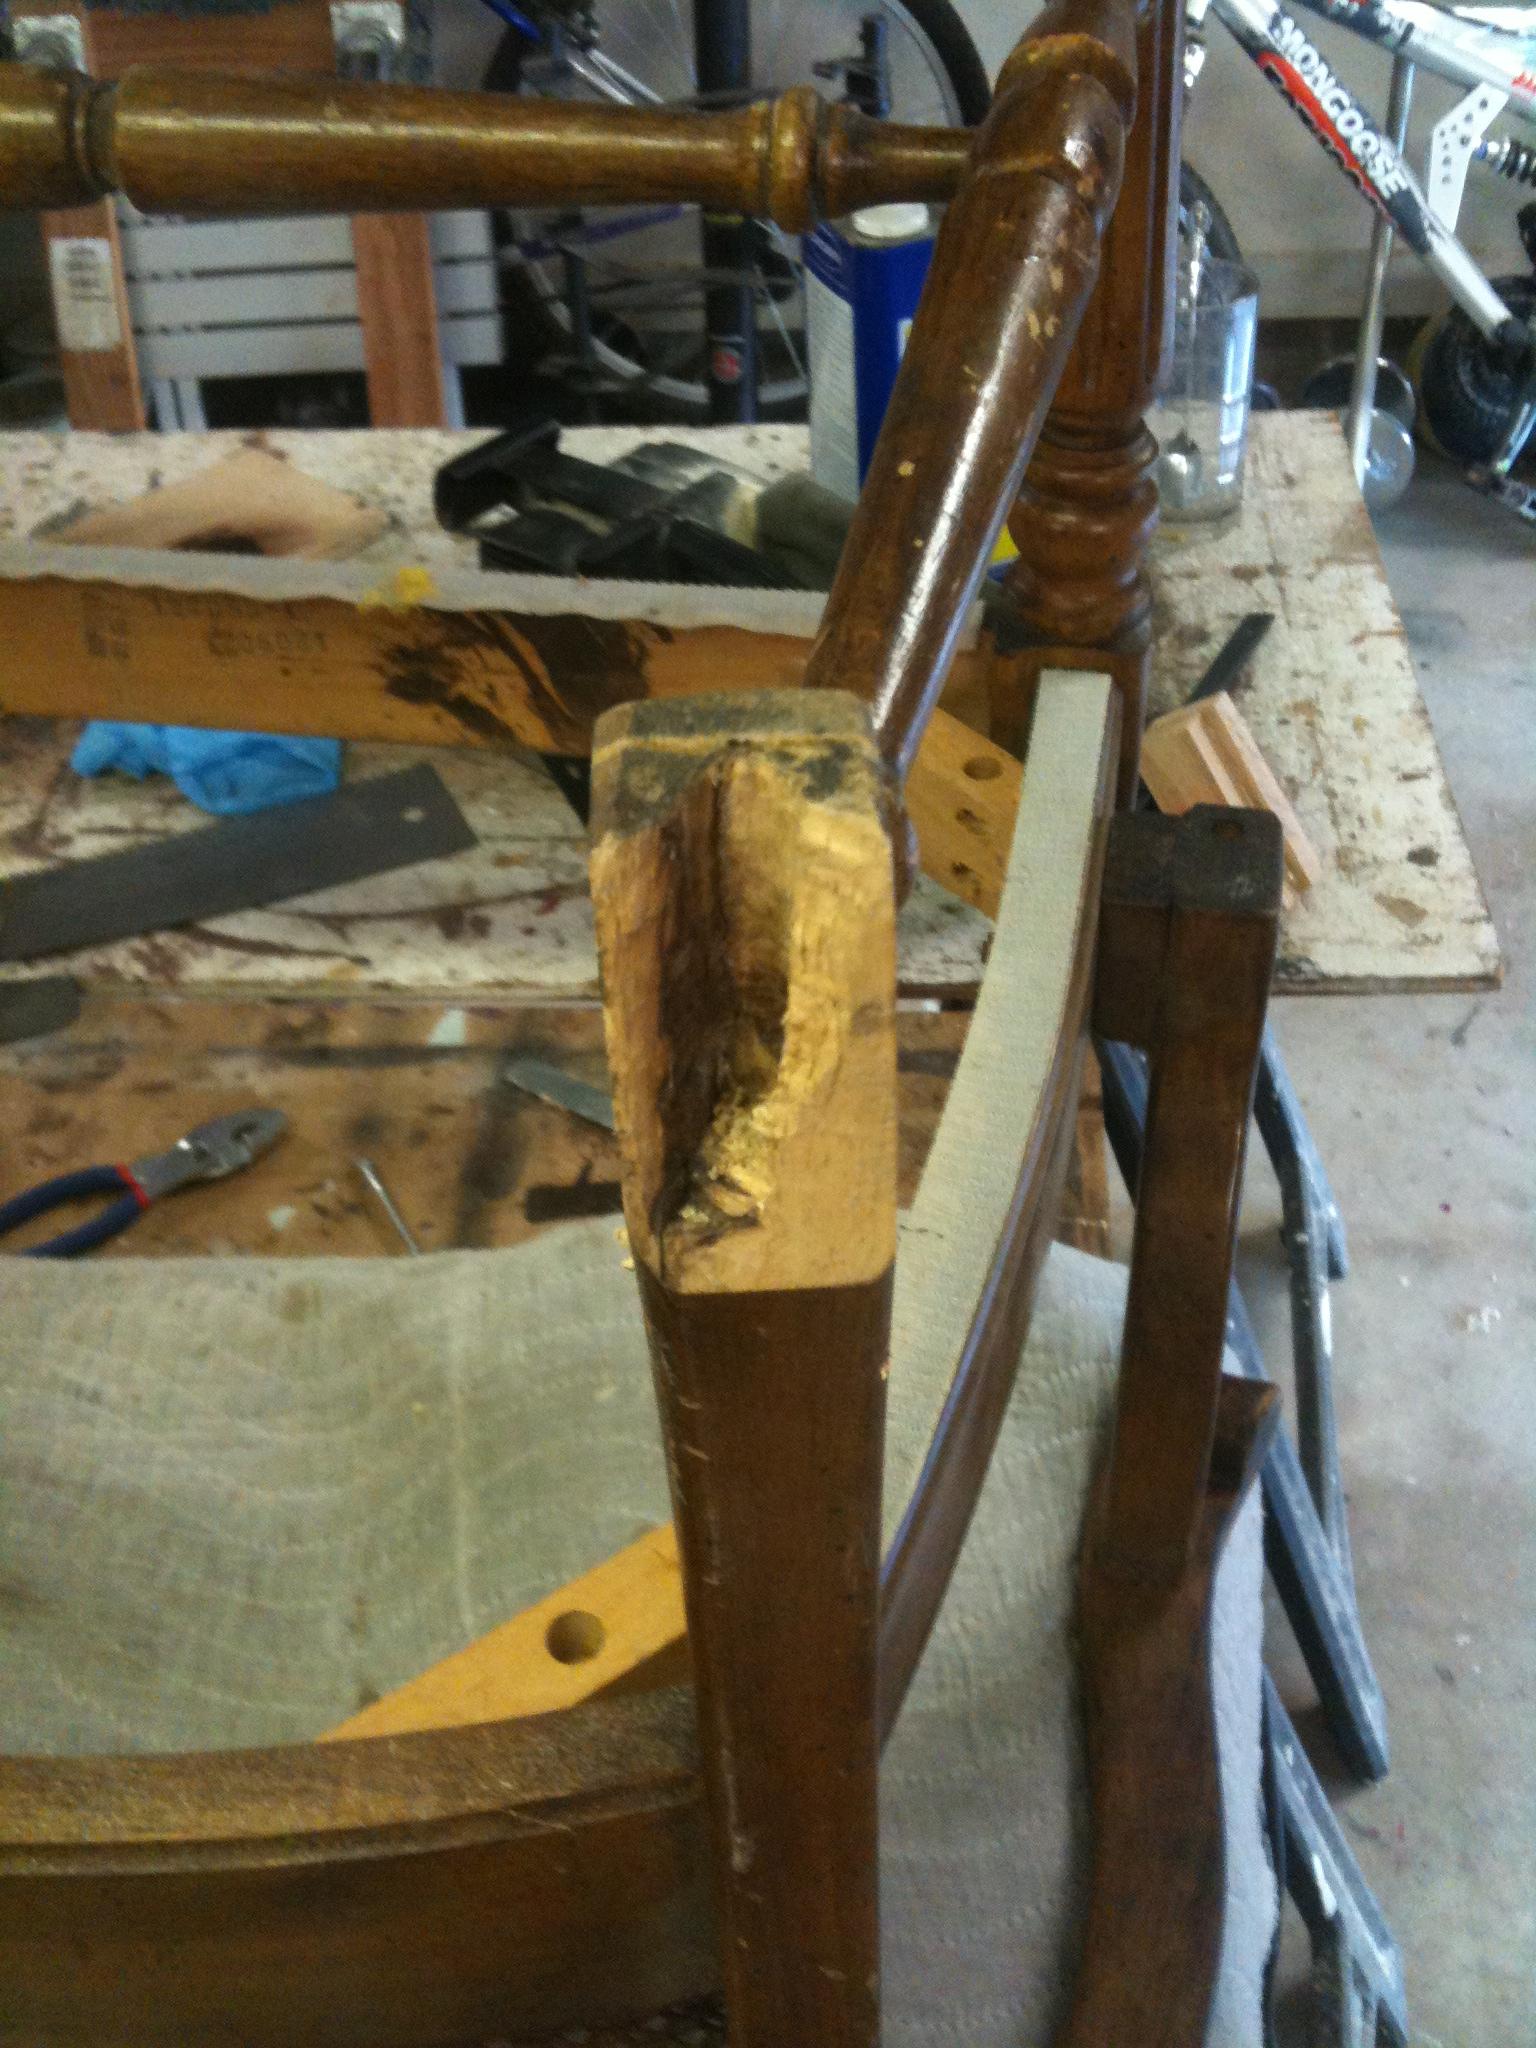 How to Fix a Broken Chair Foot